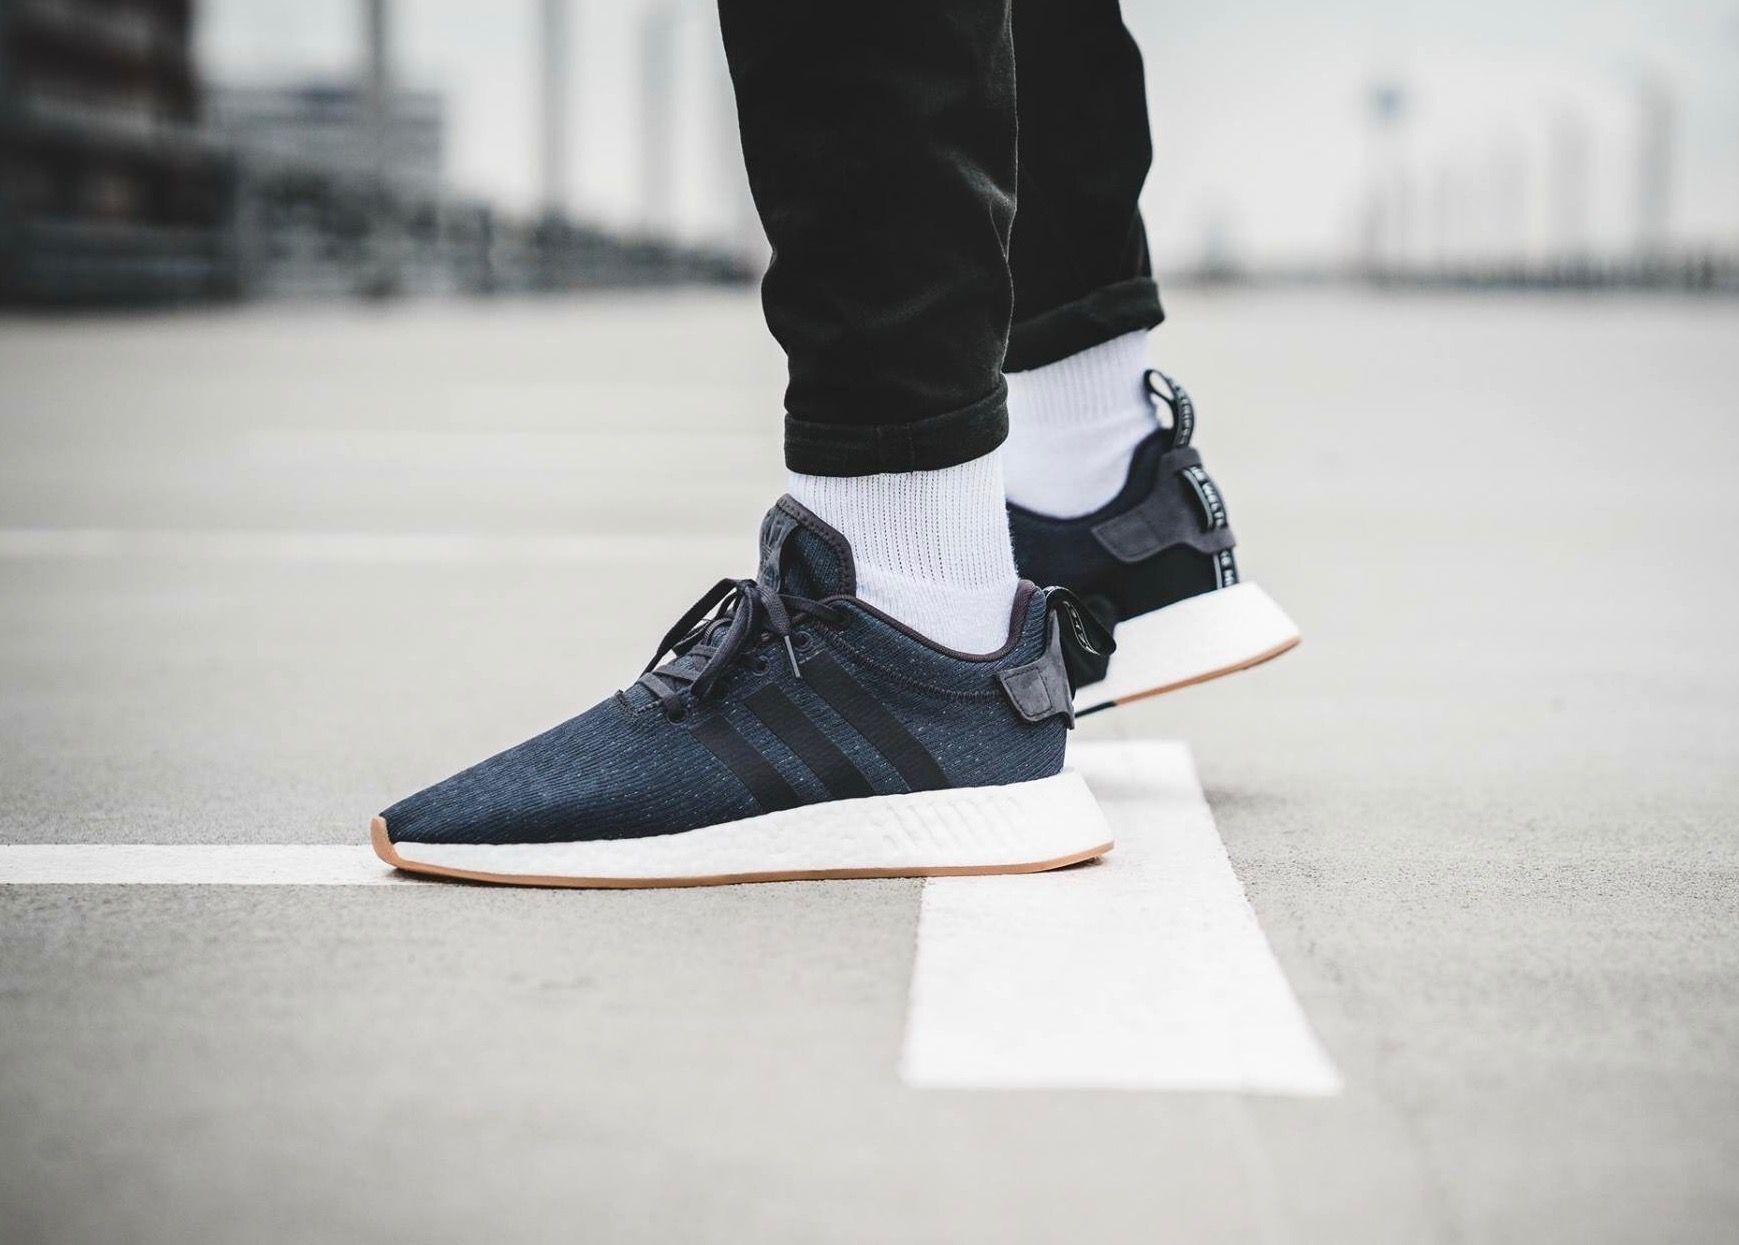 adidas Originals NMD_R2 | Fashion shoes, Latest shoe